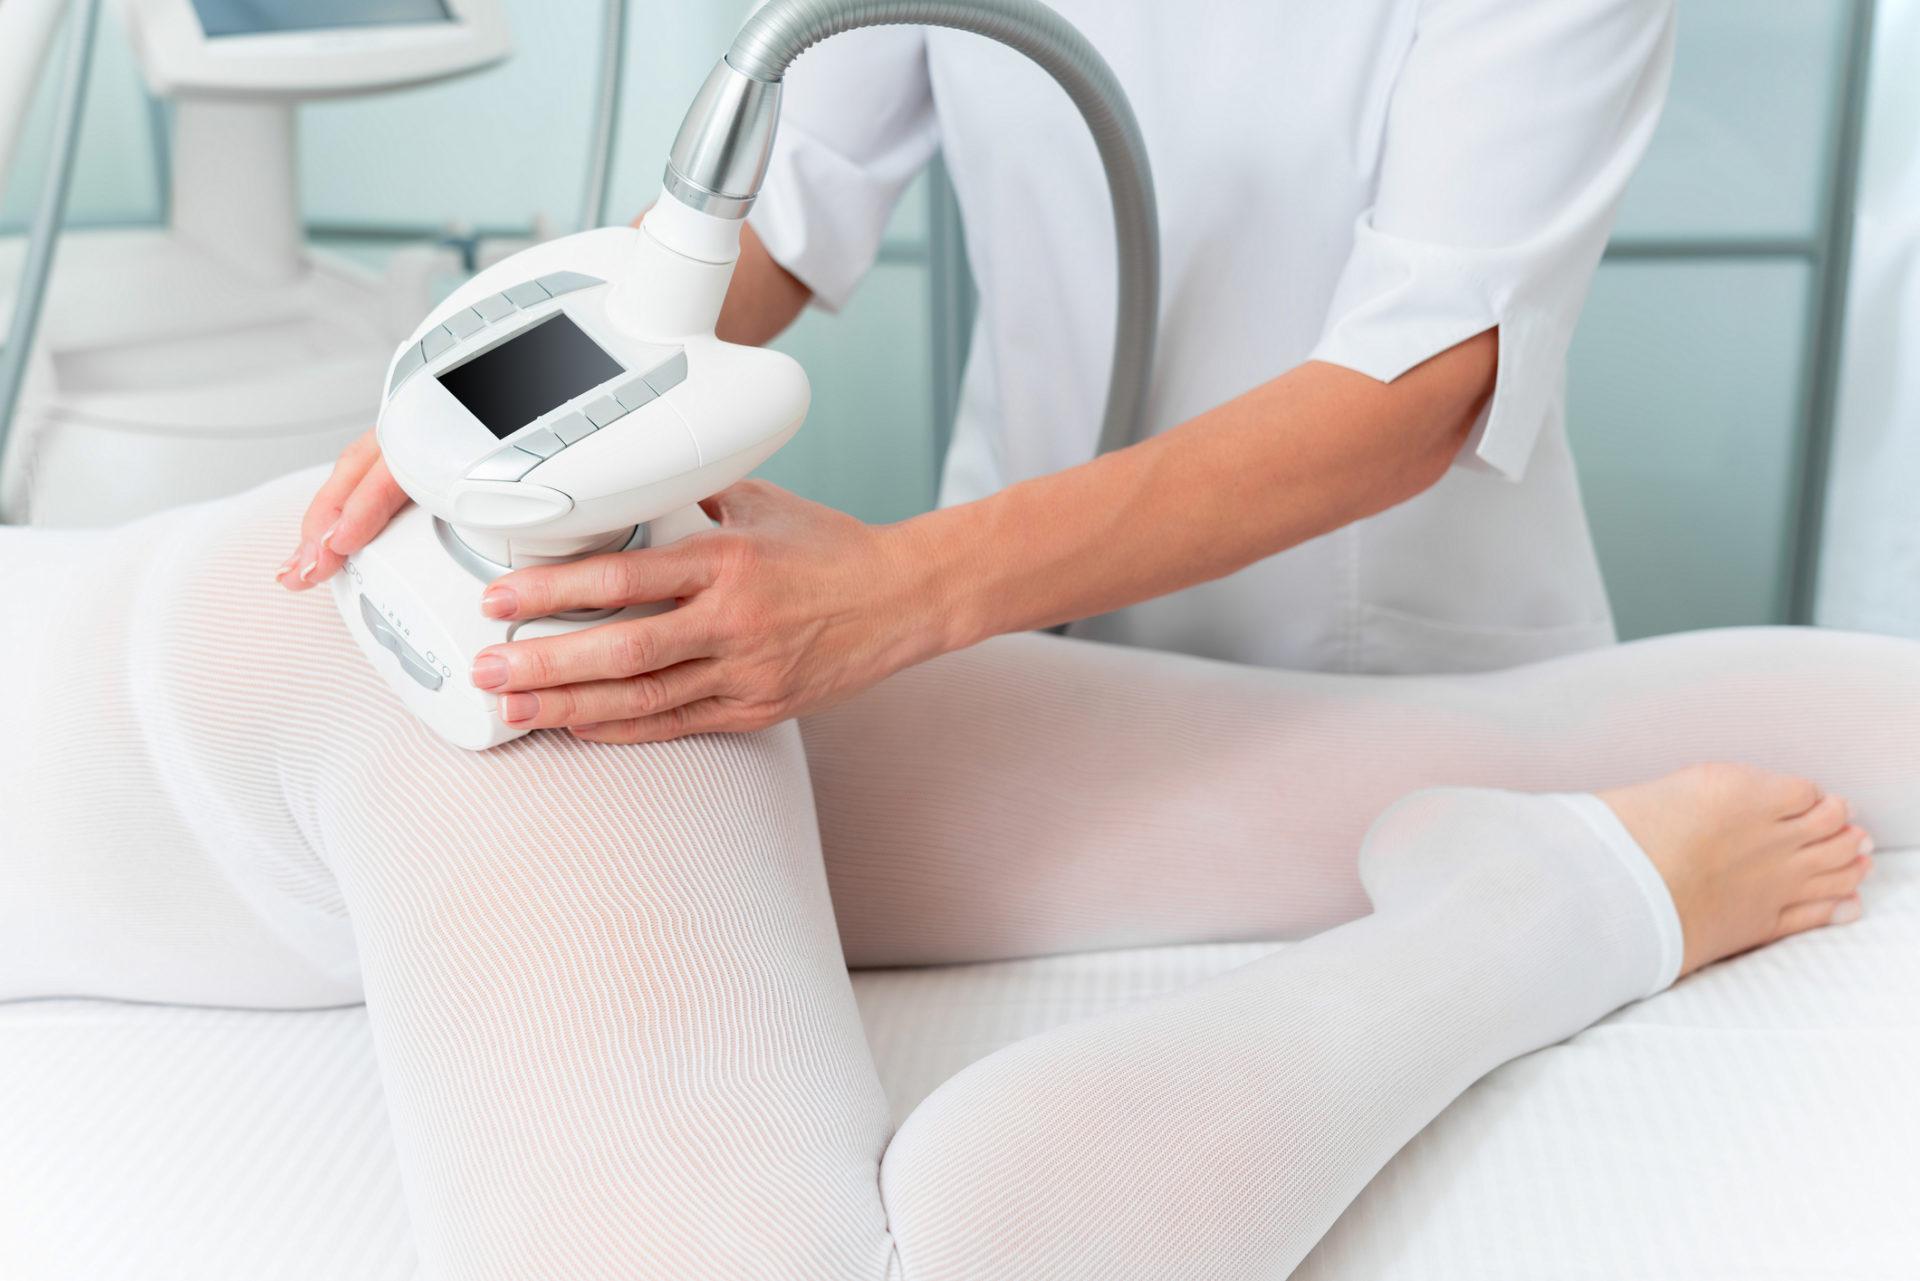 En kvinna får LPG-behandling på sitt ben